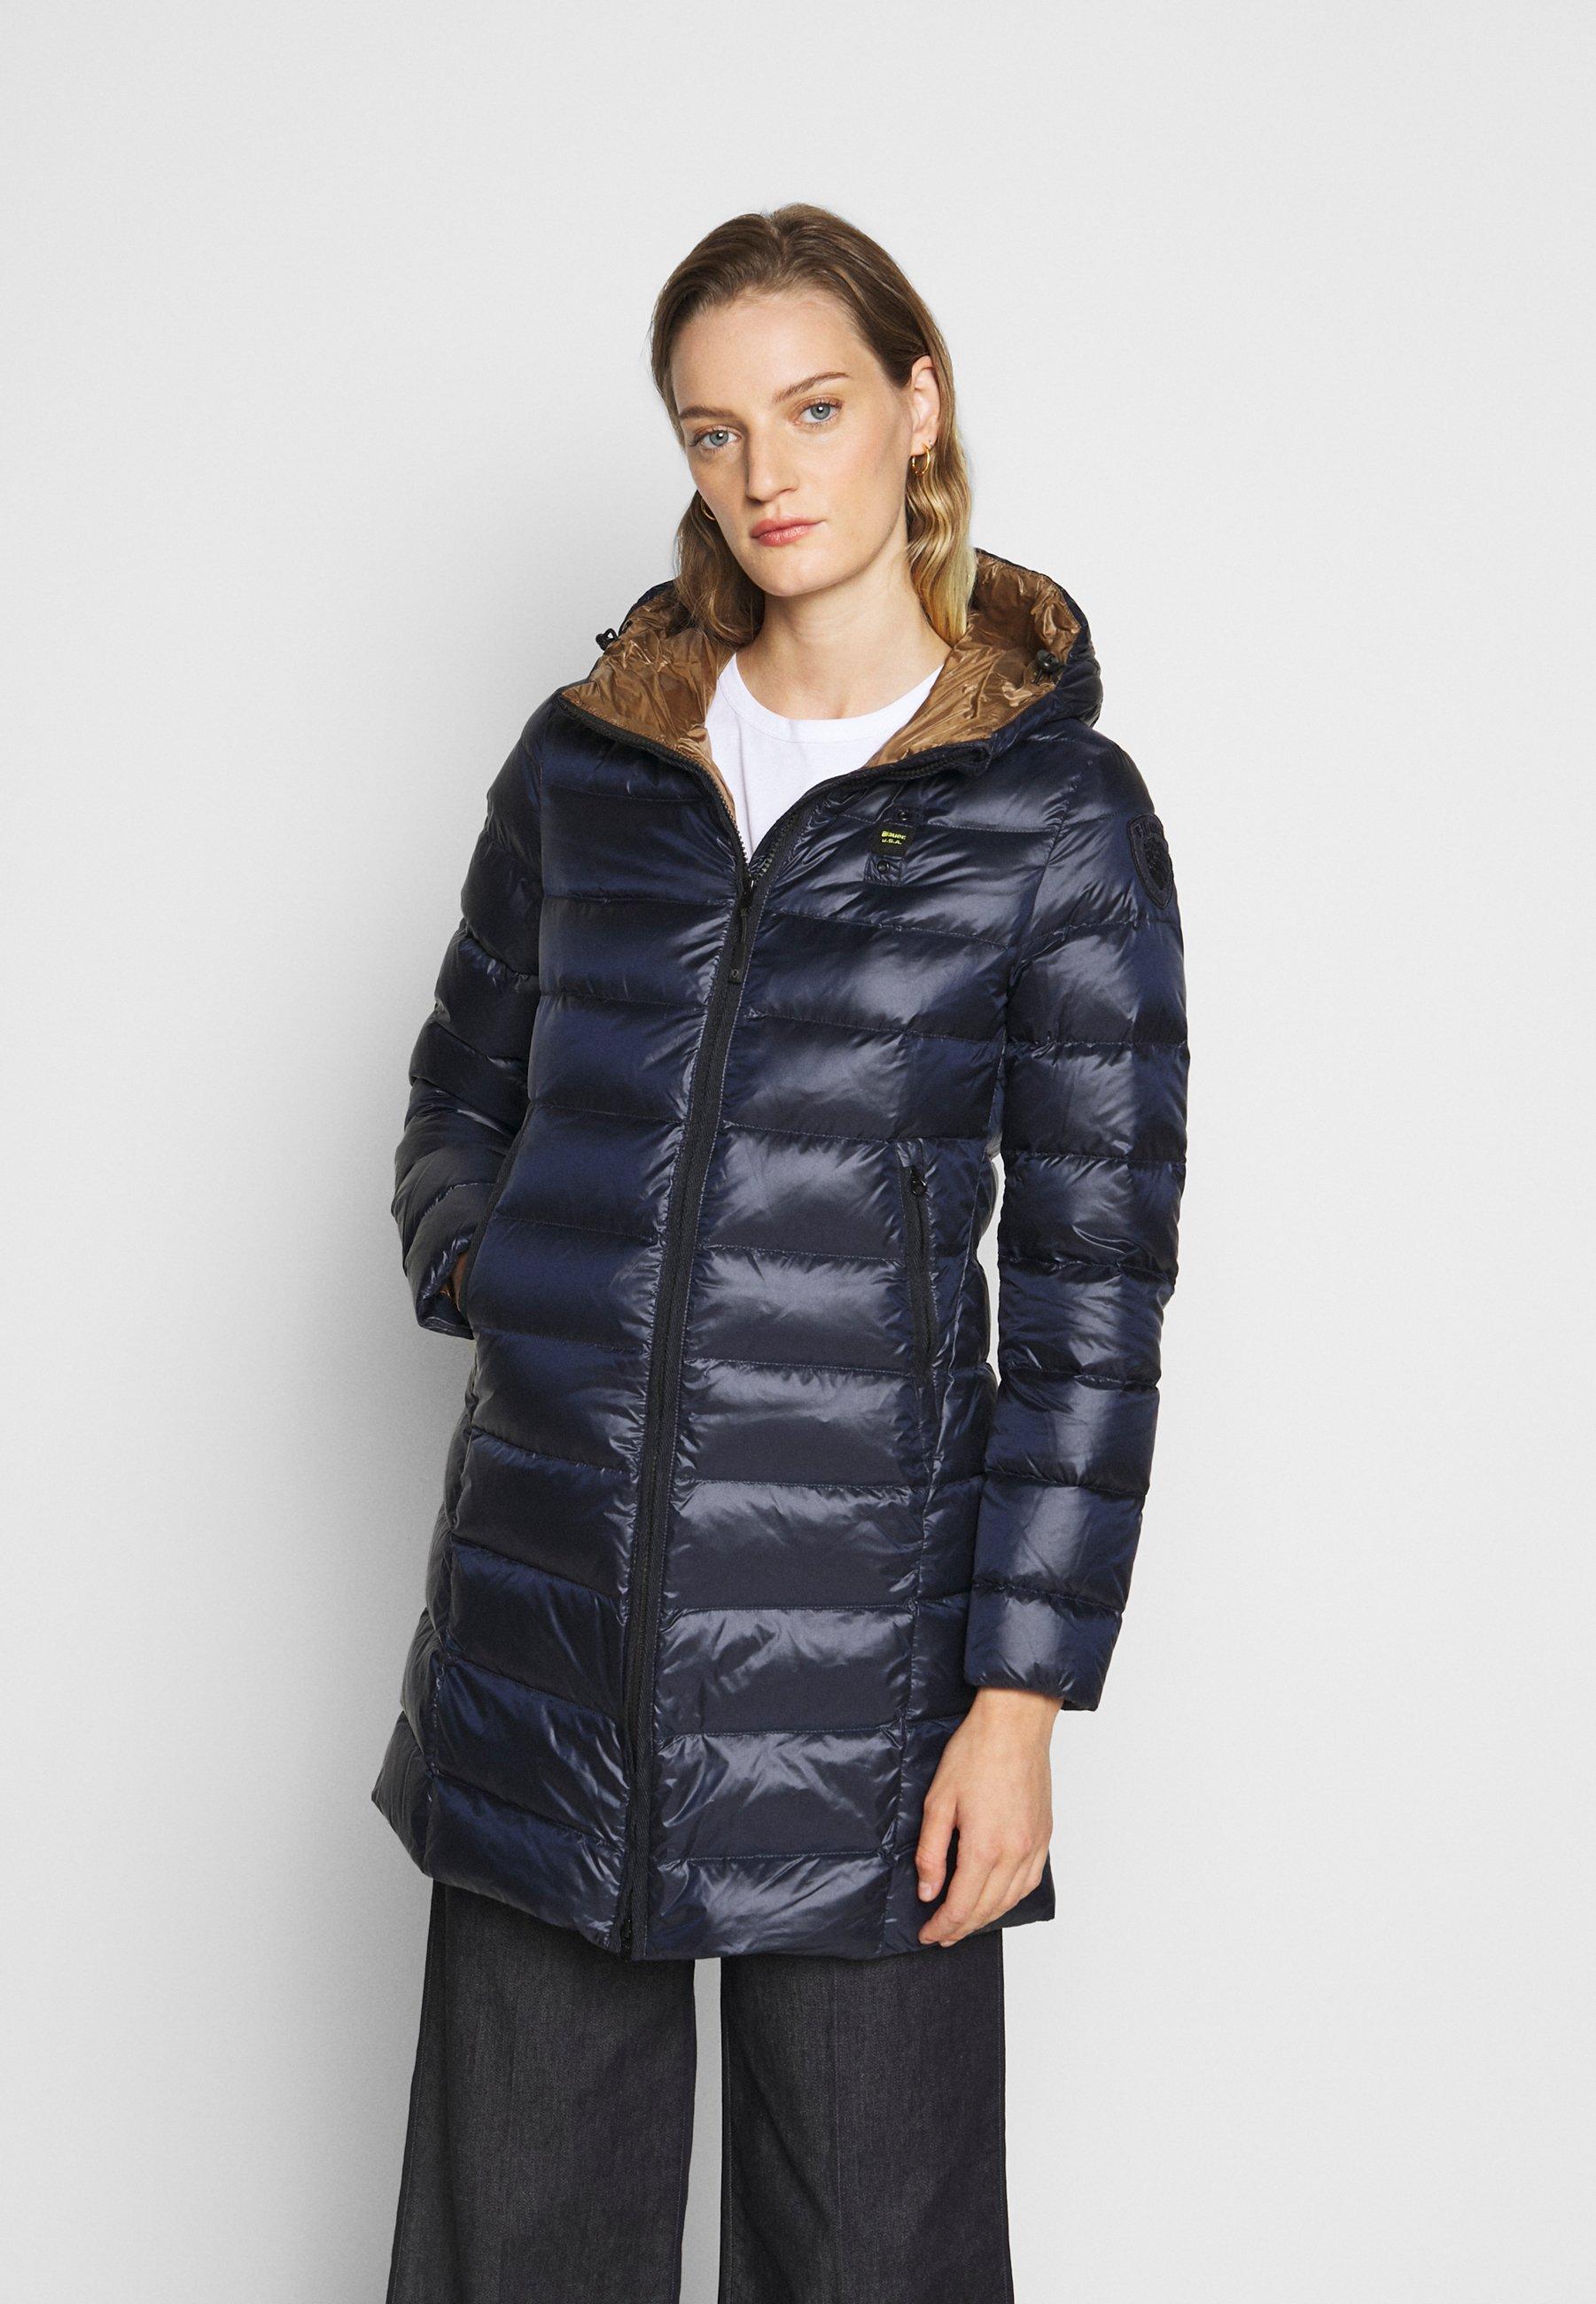 Blauer IMPERMEABILE LUNGHI IMBOTTITO - Doudoune - dark blue - Manteaux Femme 0exlF